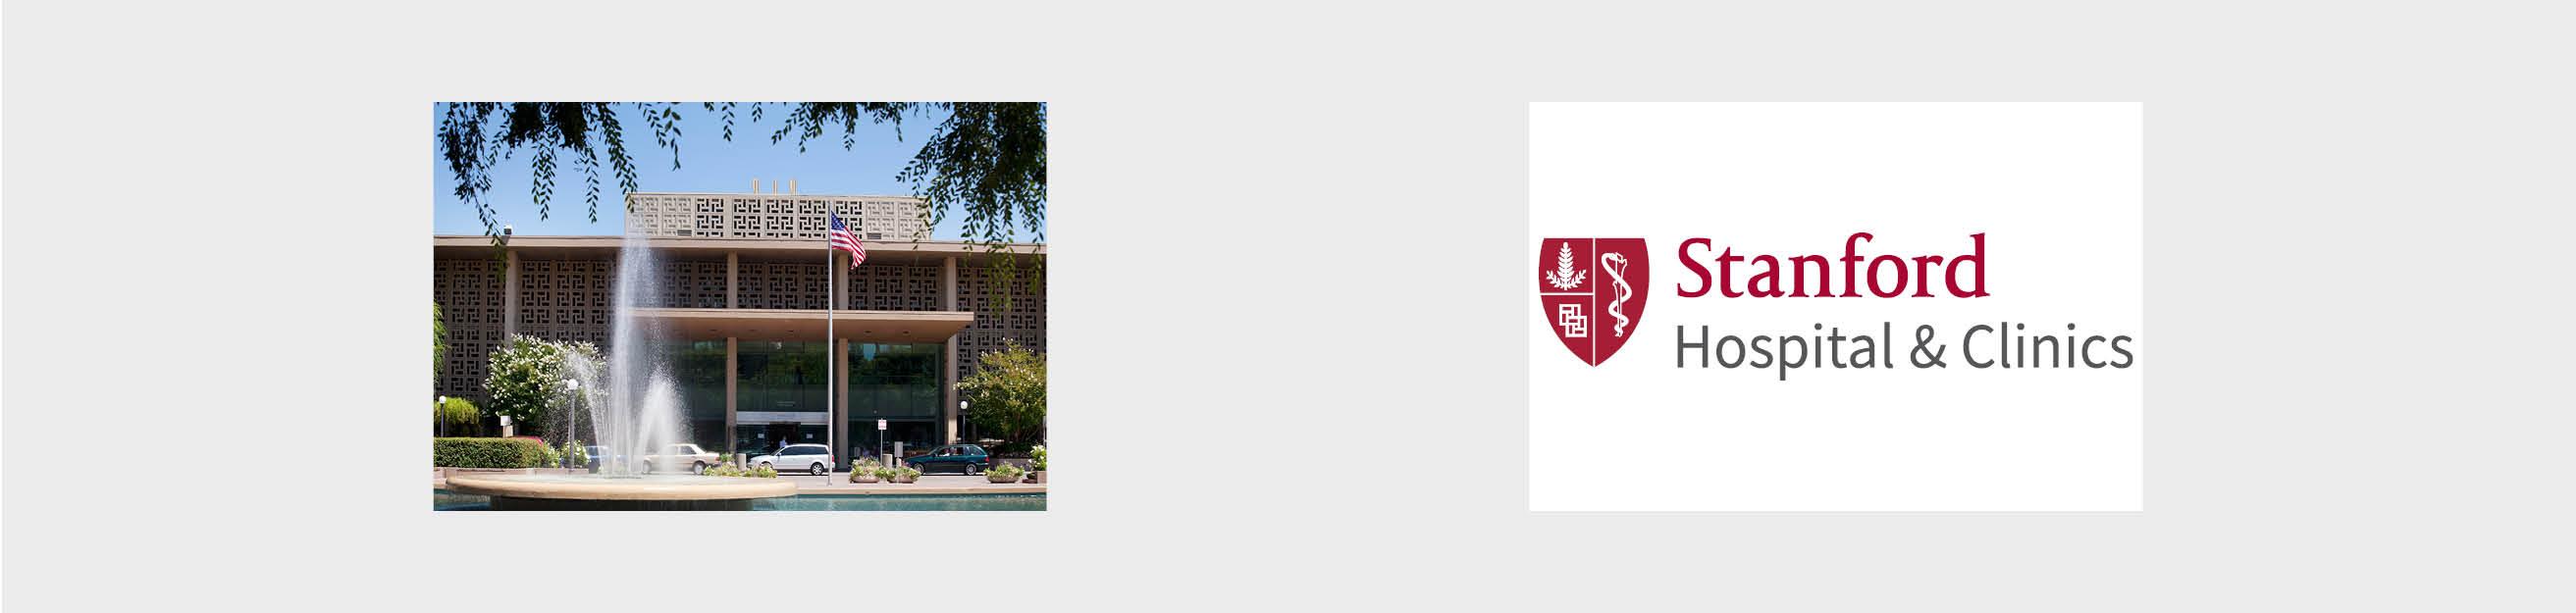 Stanford-Hospital-Clinics